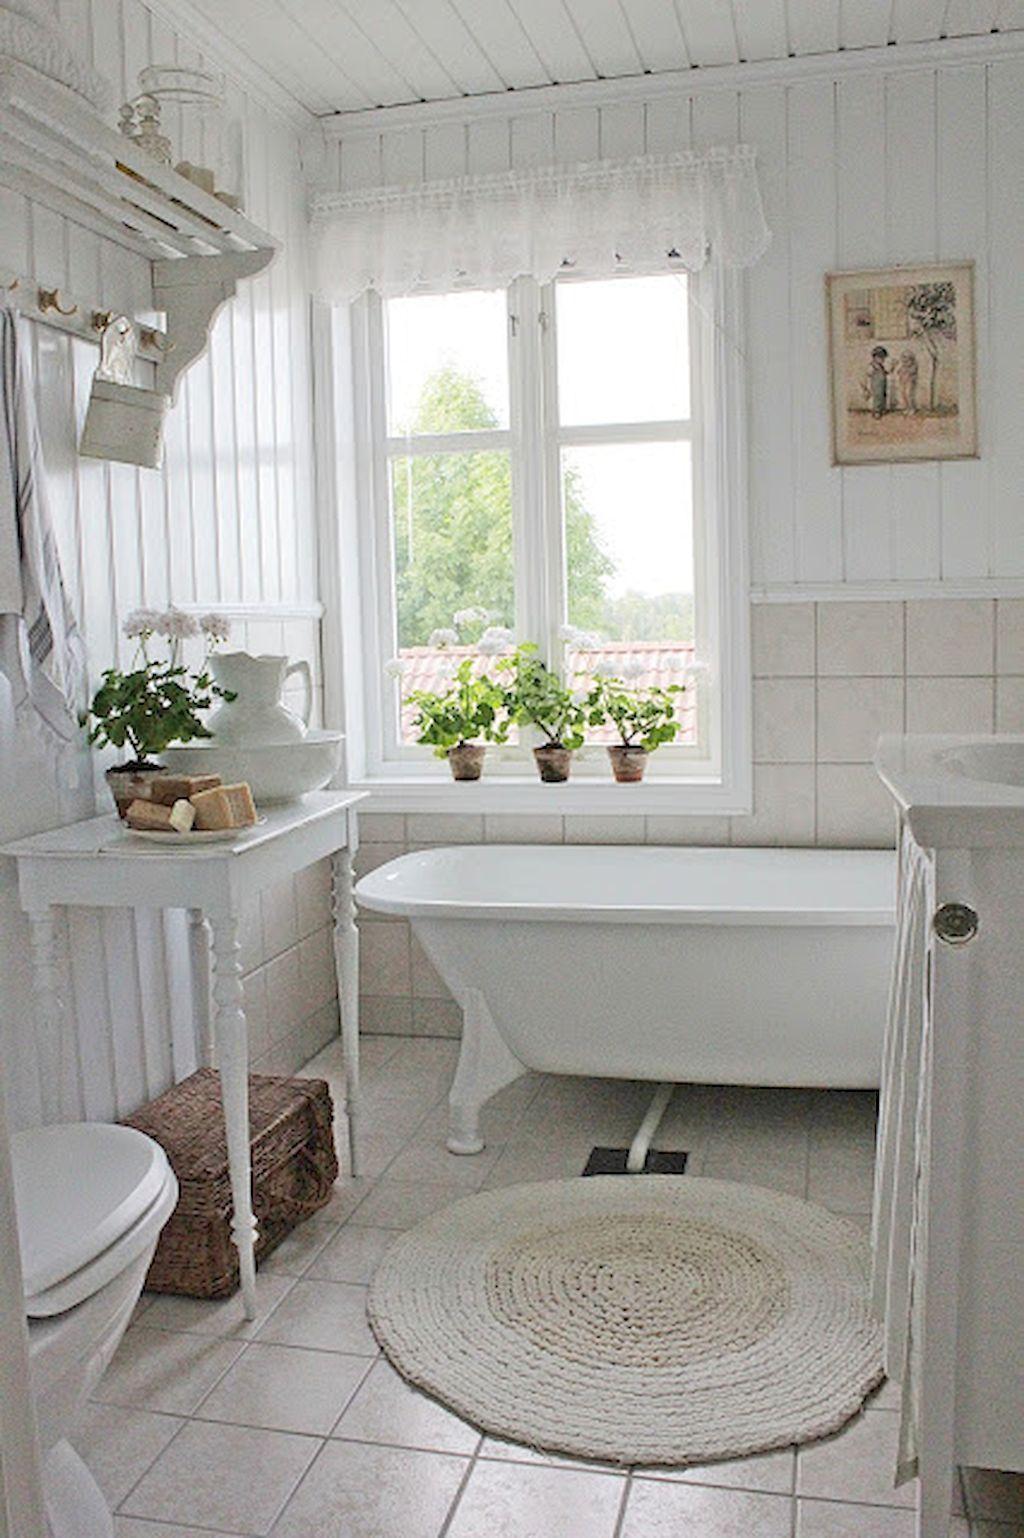 45 Awesome Shabby Chic Bathroom Decoration Ideas Bathroom Furniture Shabbychic Salle De Bains Shabby Chic Deco Salle De Bain Idee Salle De Bain